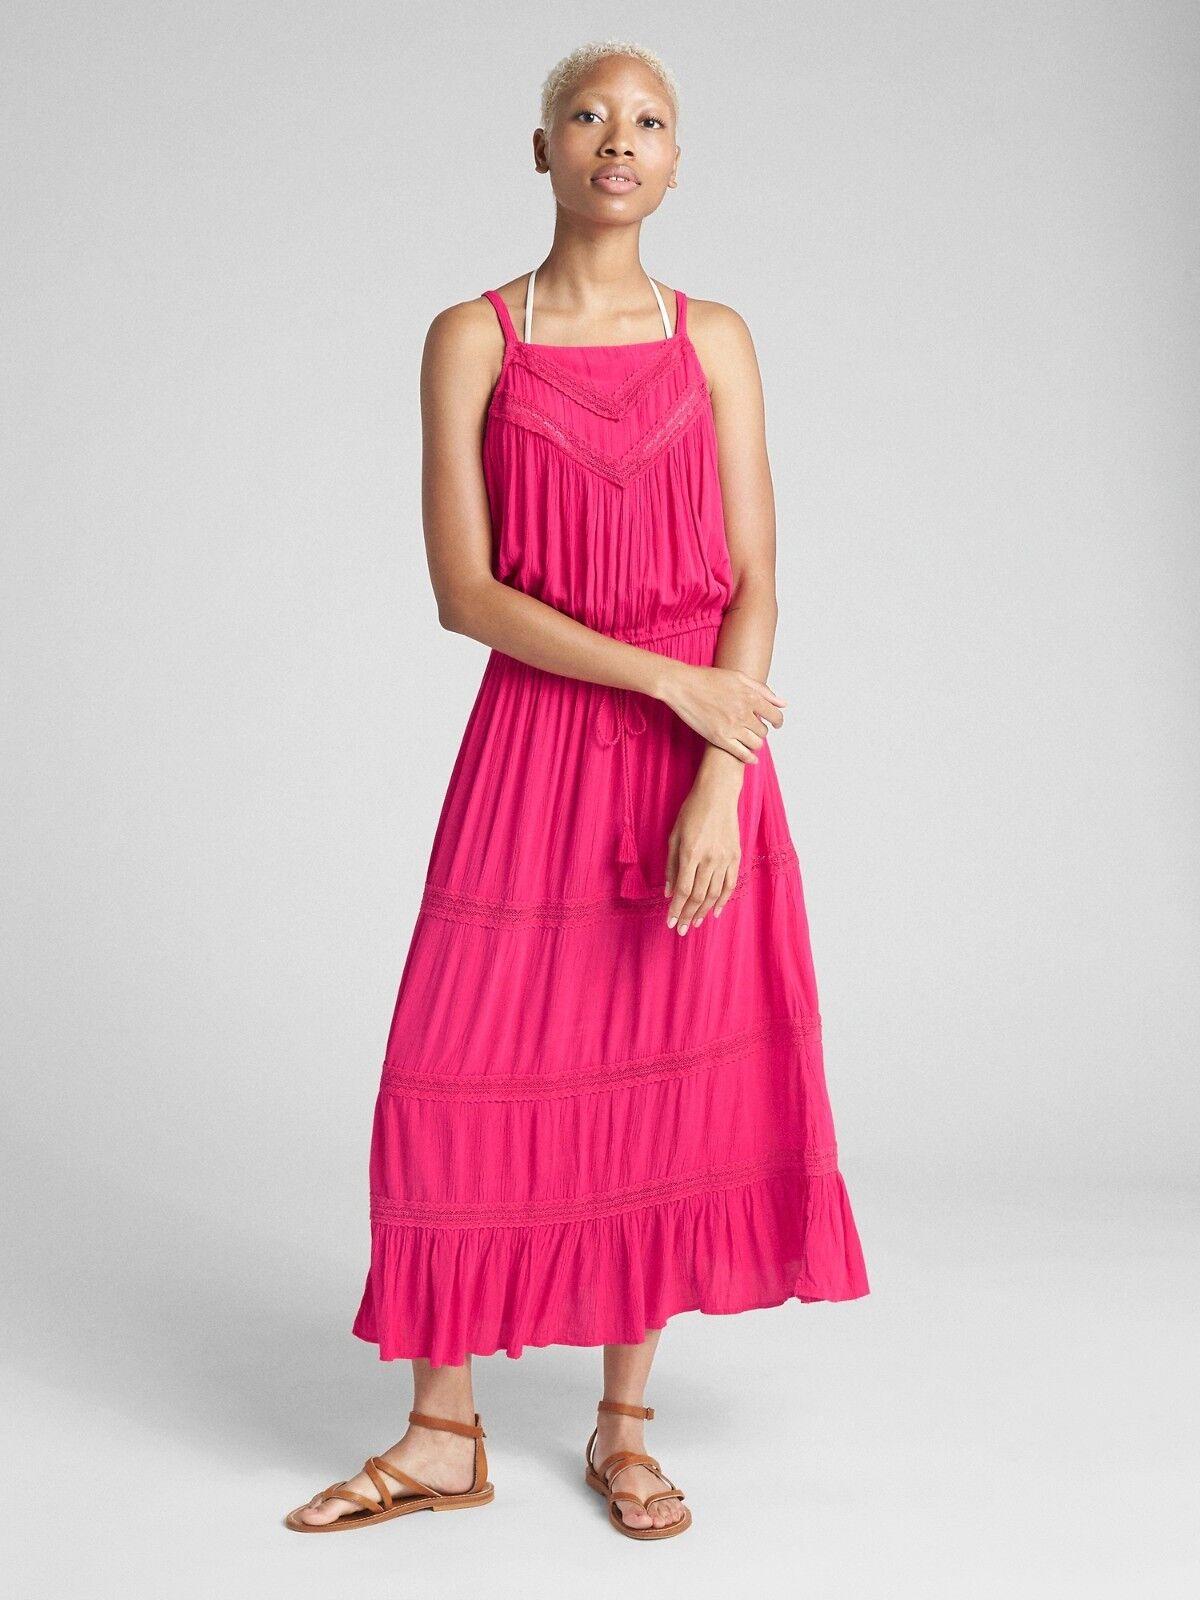 Gap Tiered Lace-Trim Maxi Dress Cover-Up, bright claret SZ MT      E1125